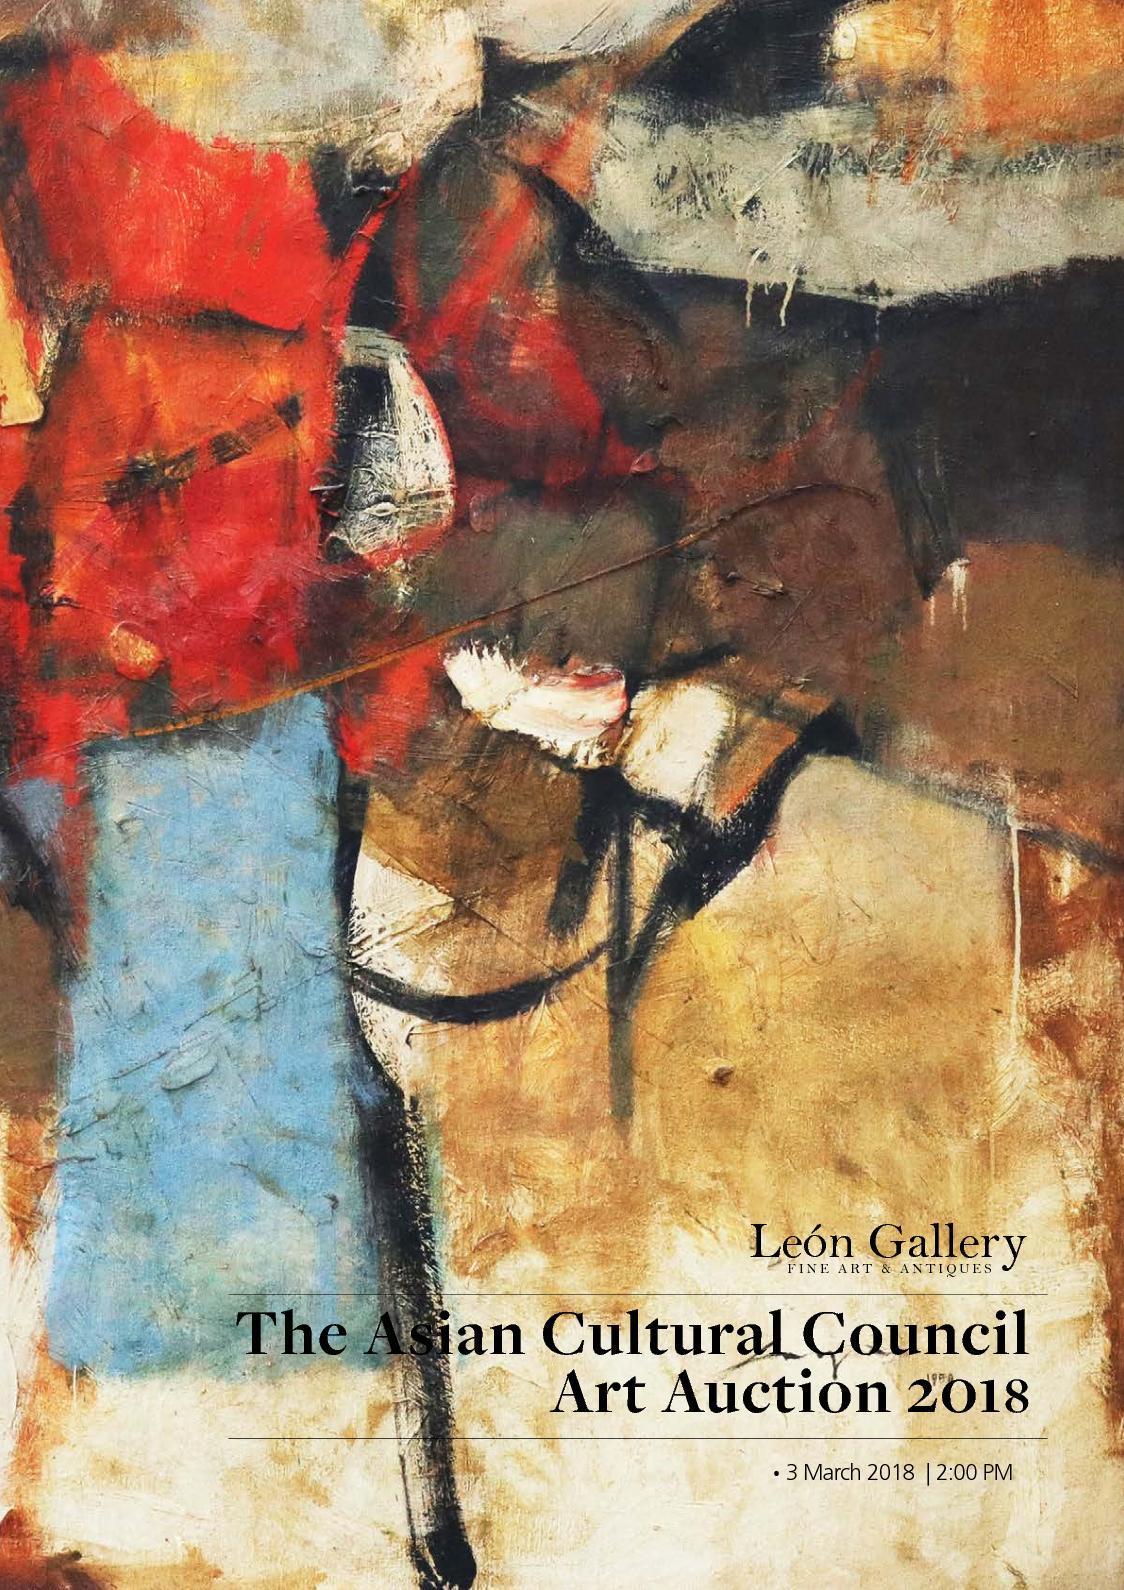 Calaméo The Asian Cultural Council Art Auction 2018